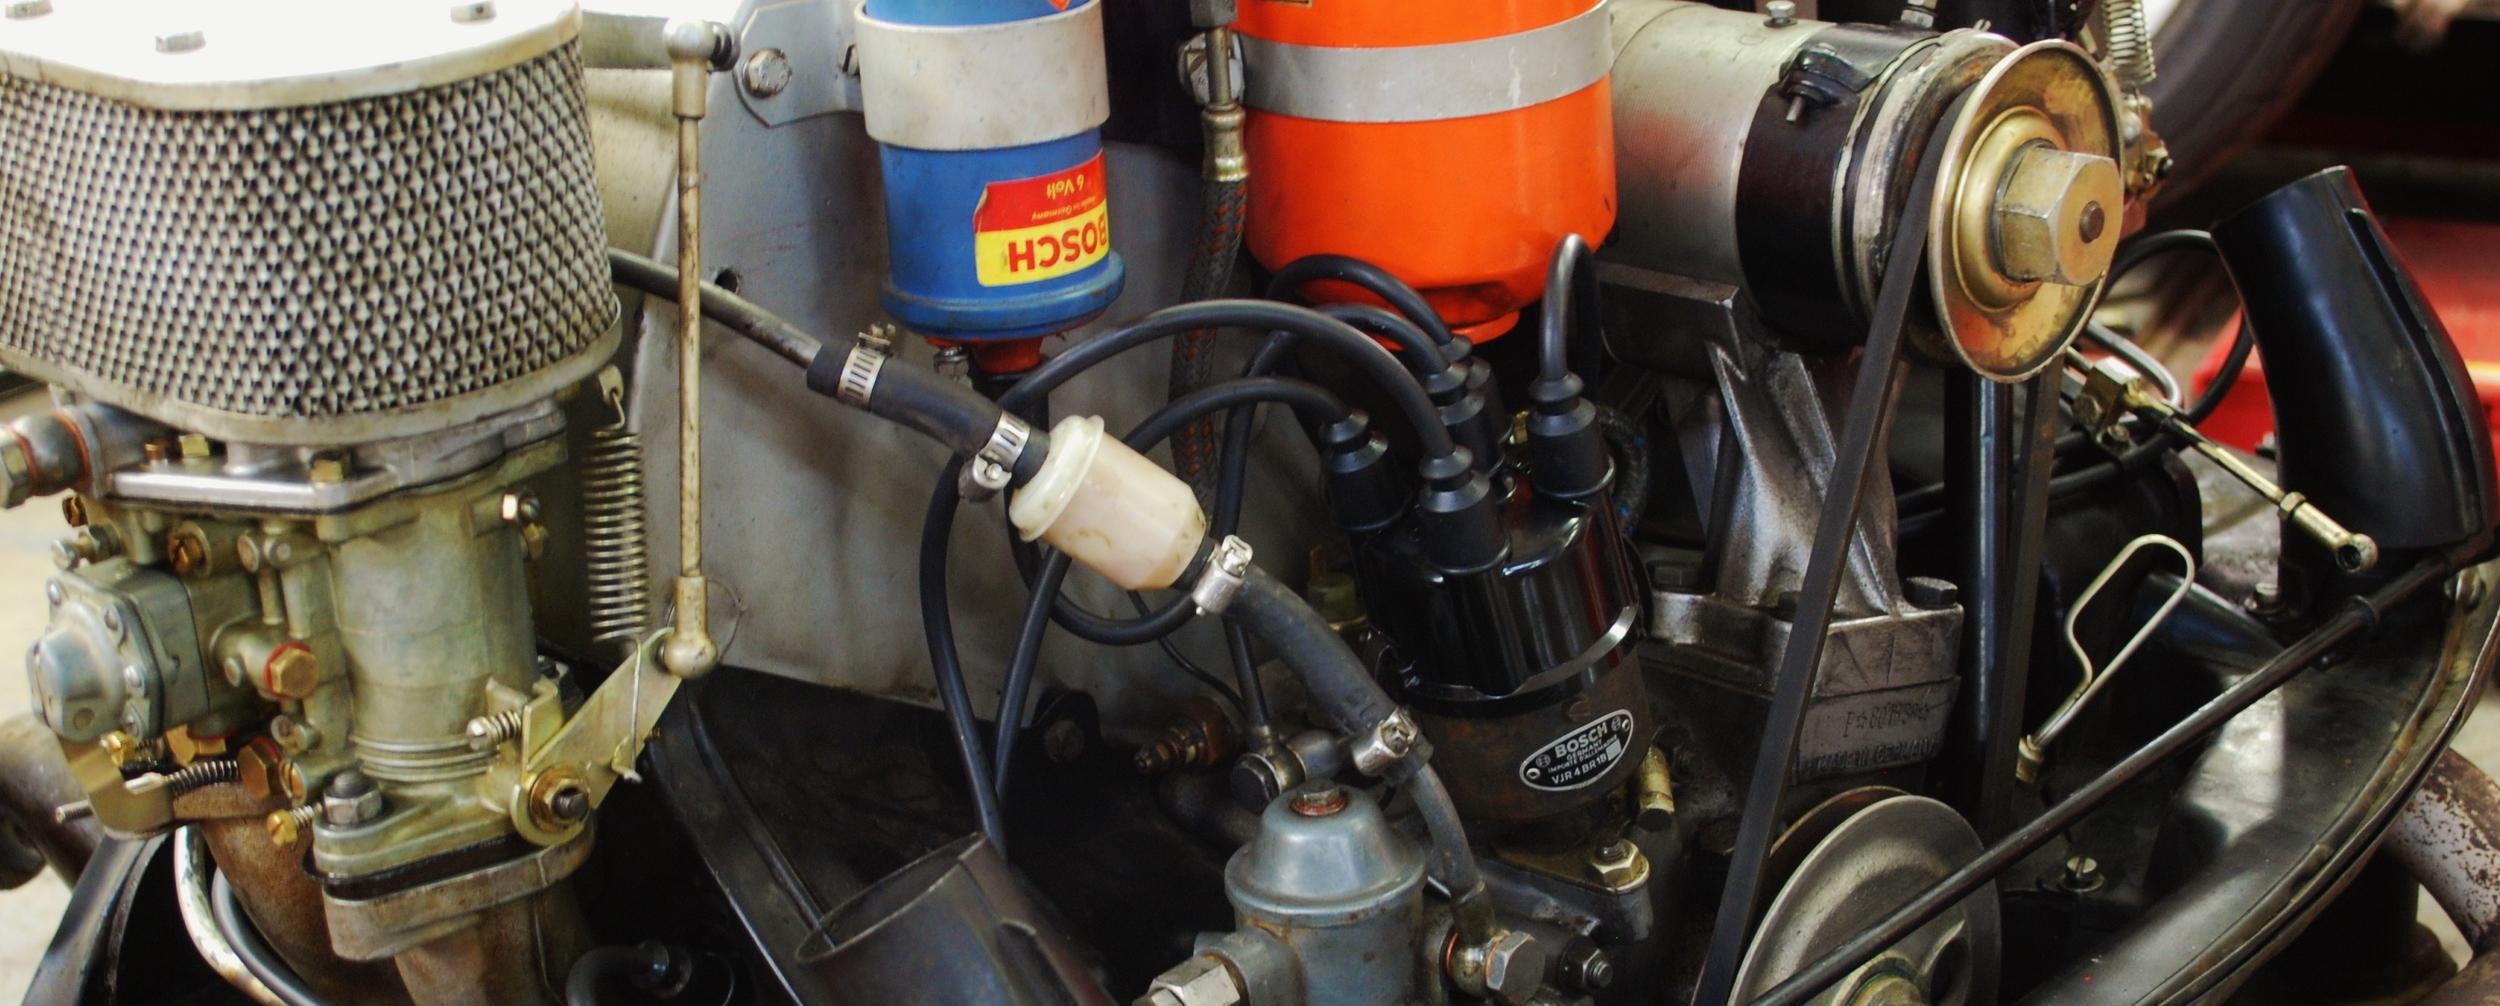 356 engine.jpg